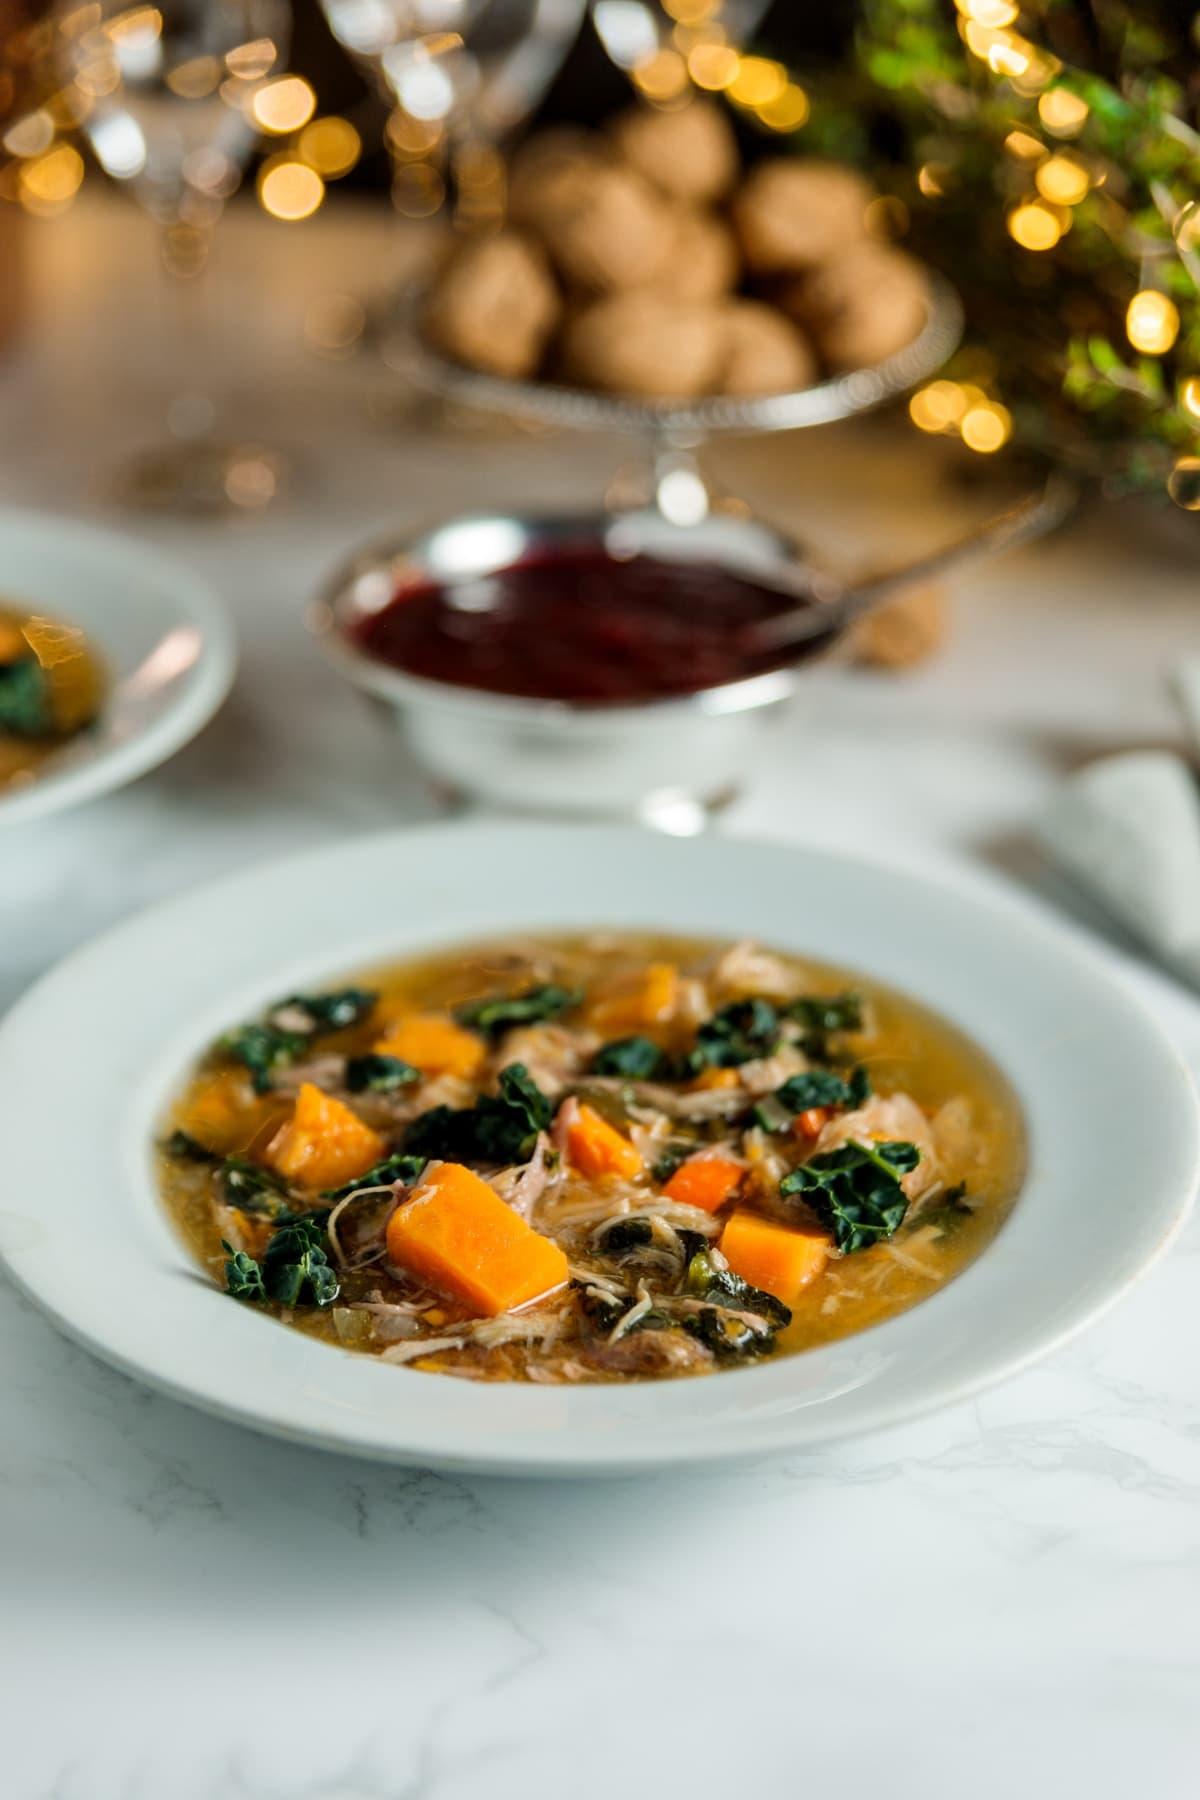 Slow Cooker Turkey, Sweet Potato + Kale Soup | Wyse Guide